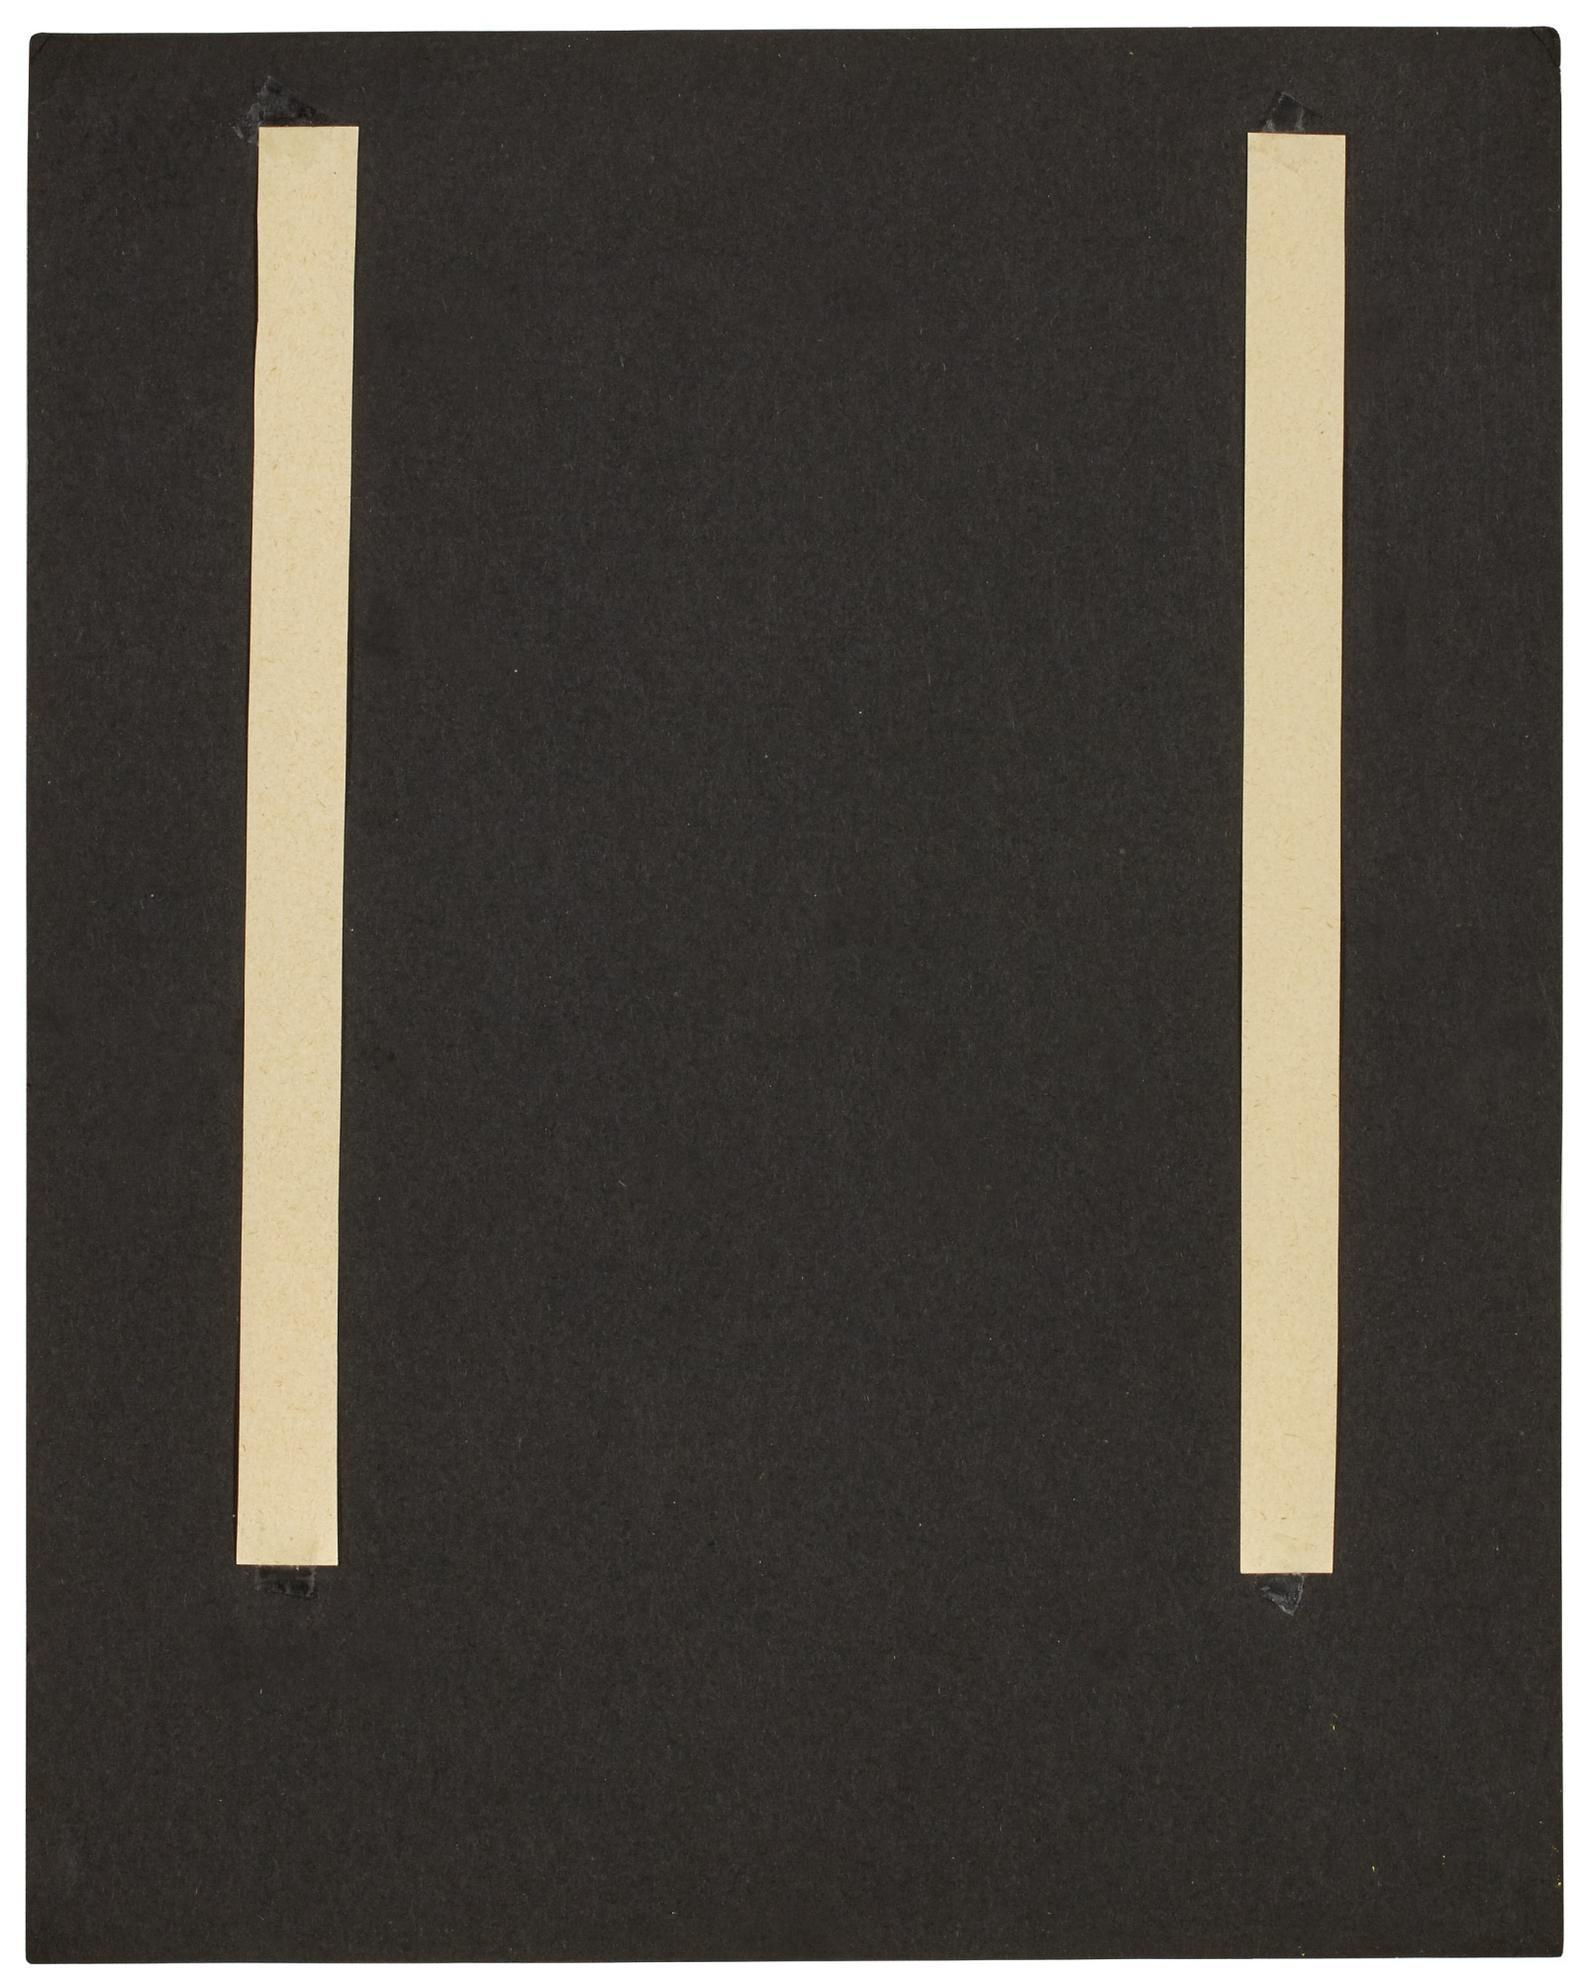 John McLaughlin-Untitled-1974